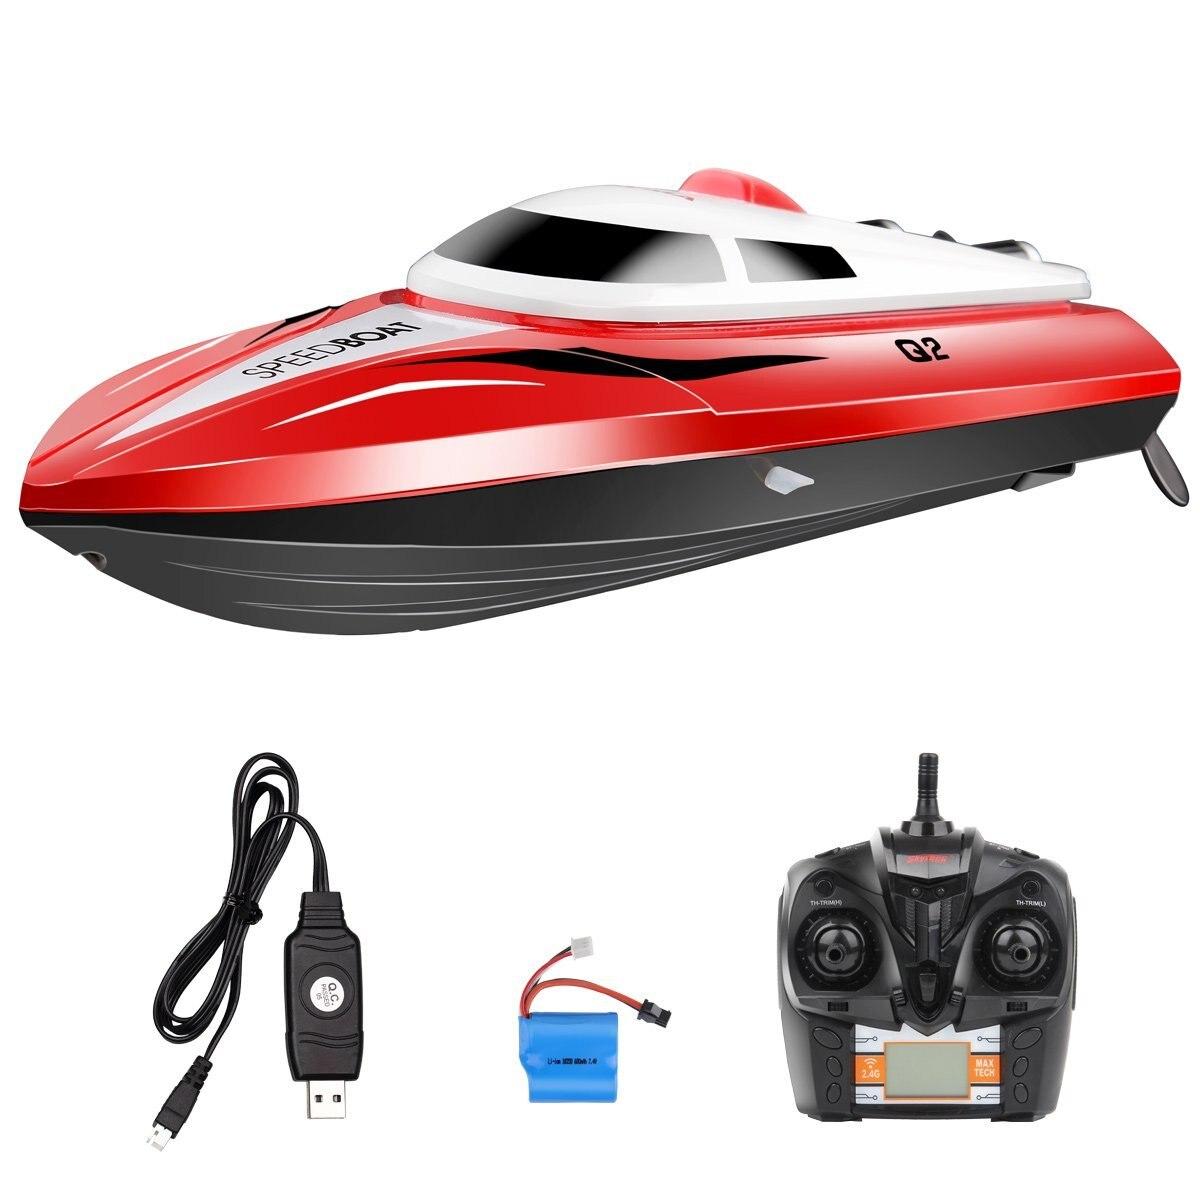 EBOYU(TM) SYMA Q2 RC Boat Water Sensor Switch Cooling Device 2.4GHZ 4CH Remote Control Speedboat<br><br>Aliexpress